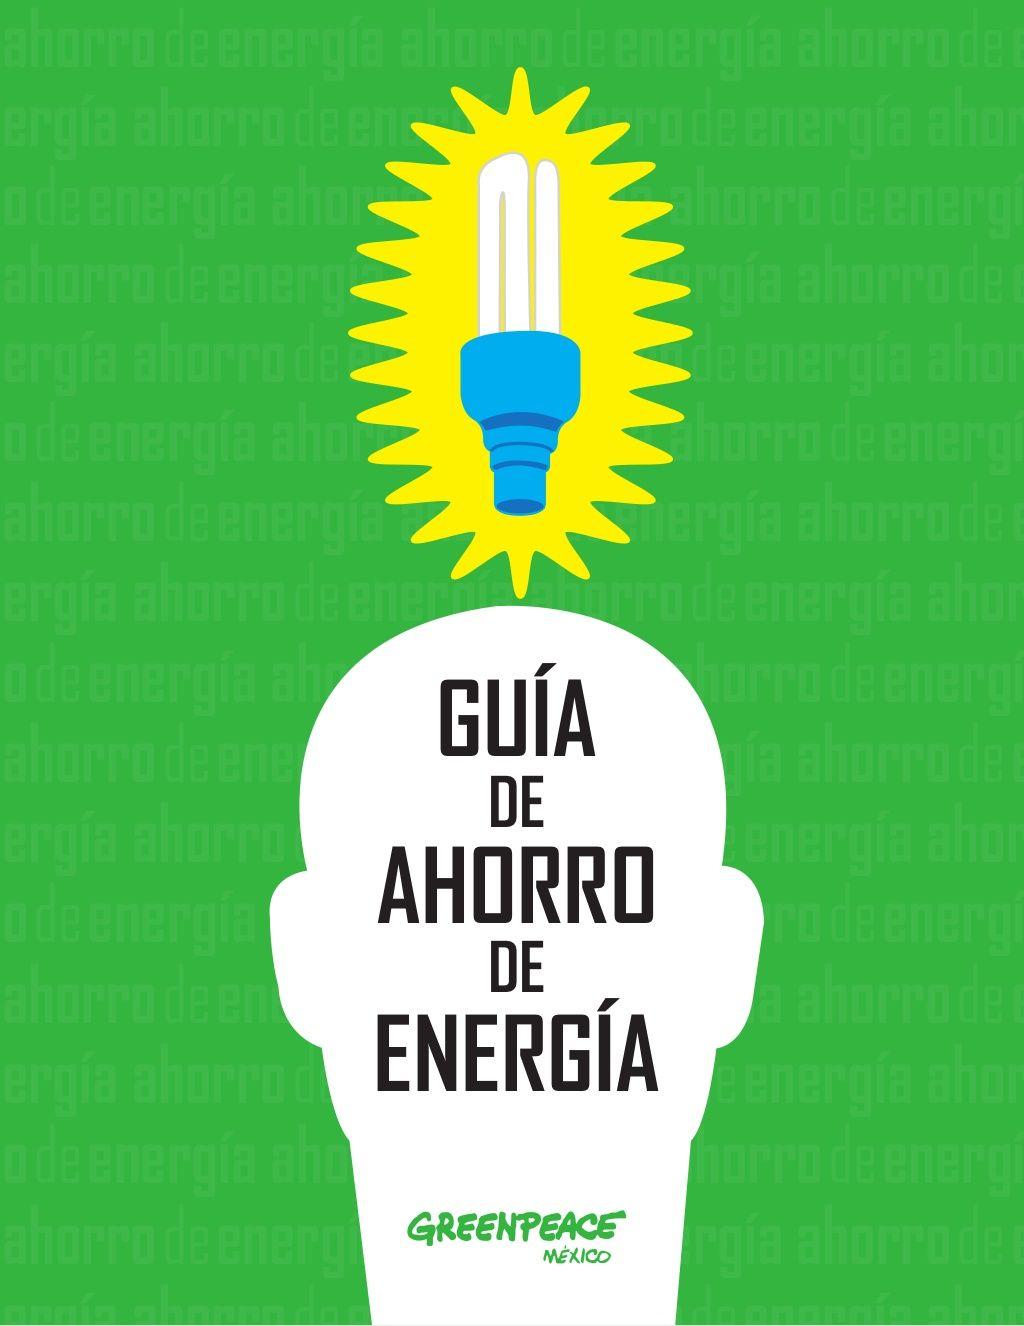 Guia De Ahorro Energetico De Greenpeace Ahorro De Energia Energia Ahorro